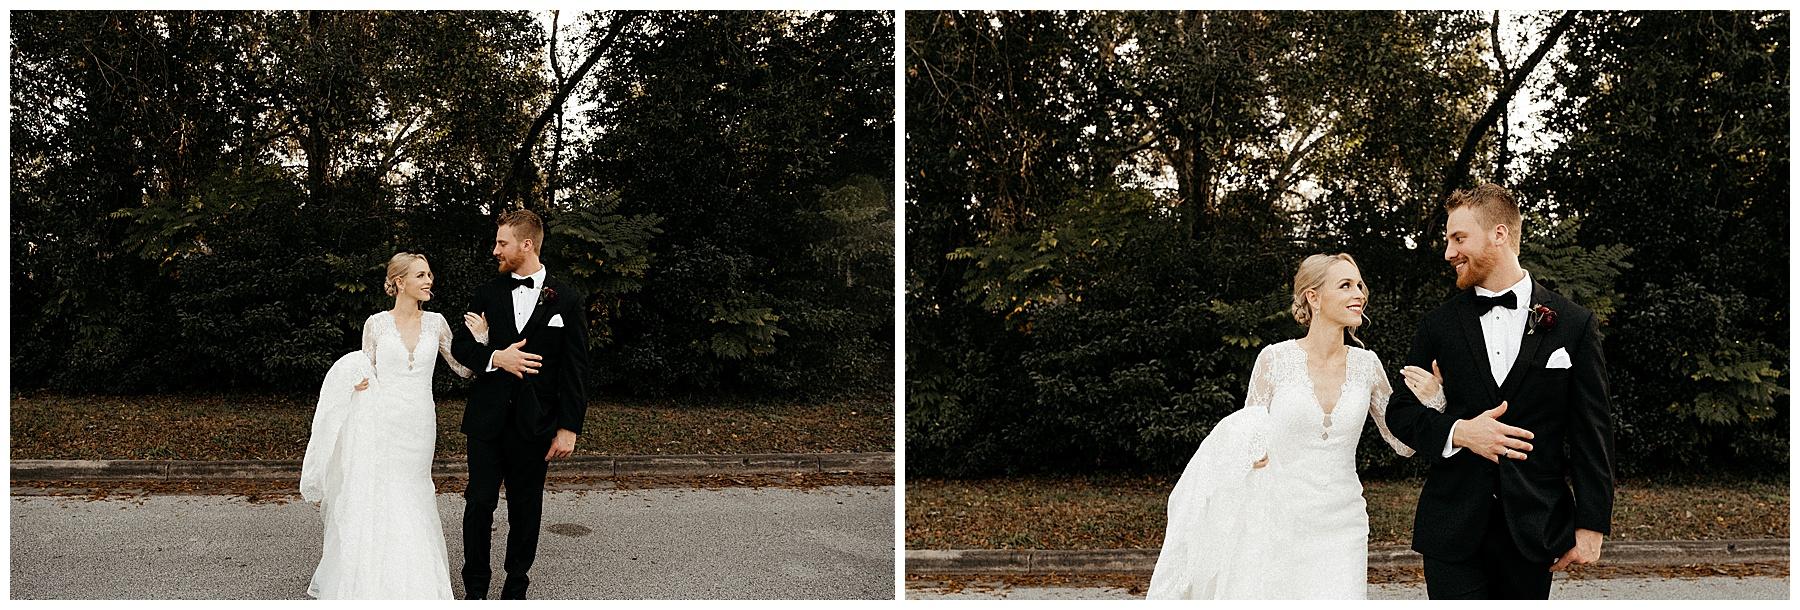 Rachel + Luke-117.jpg